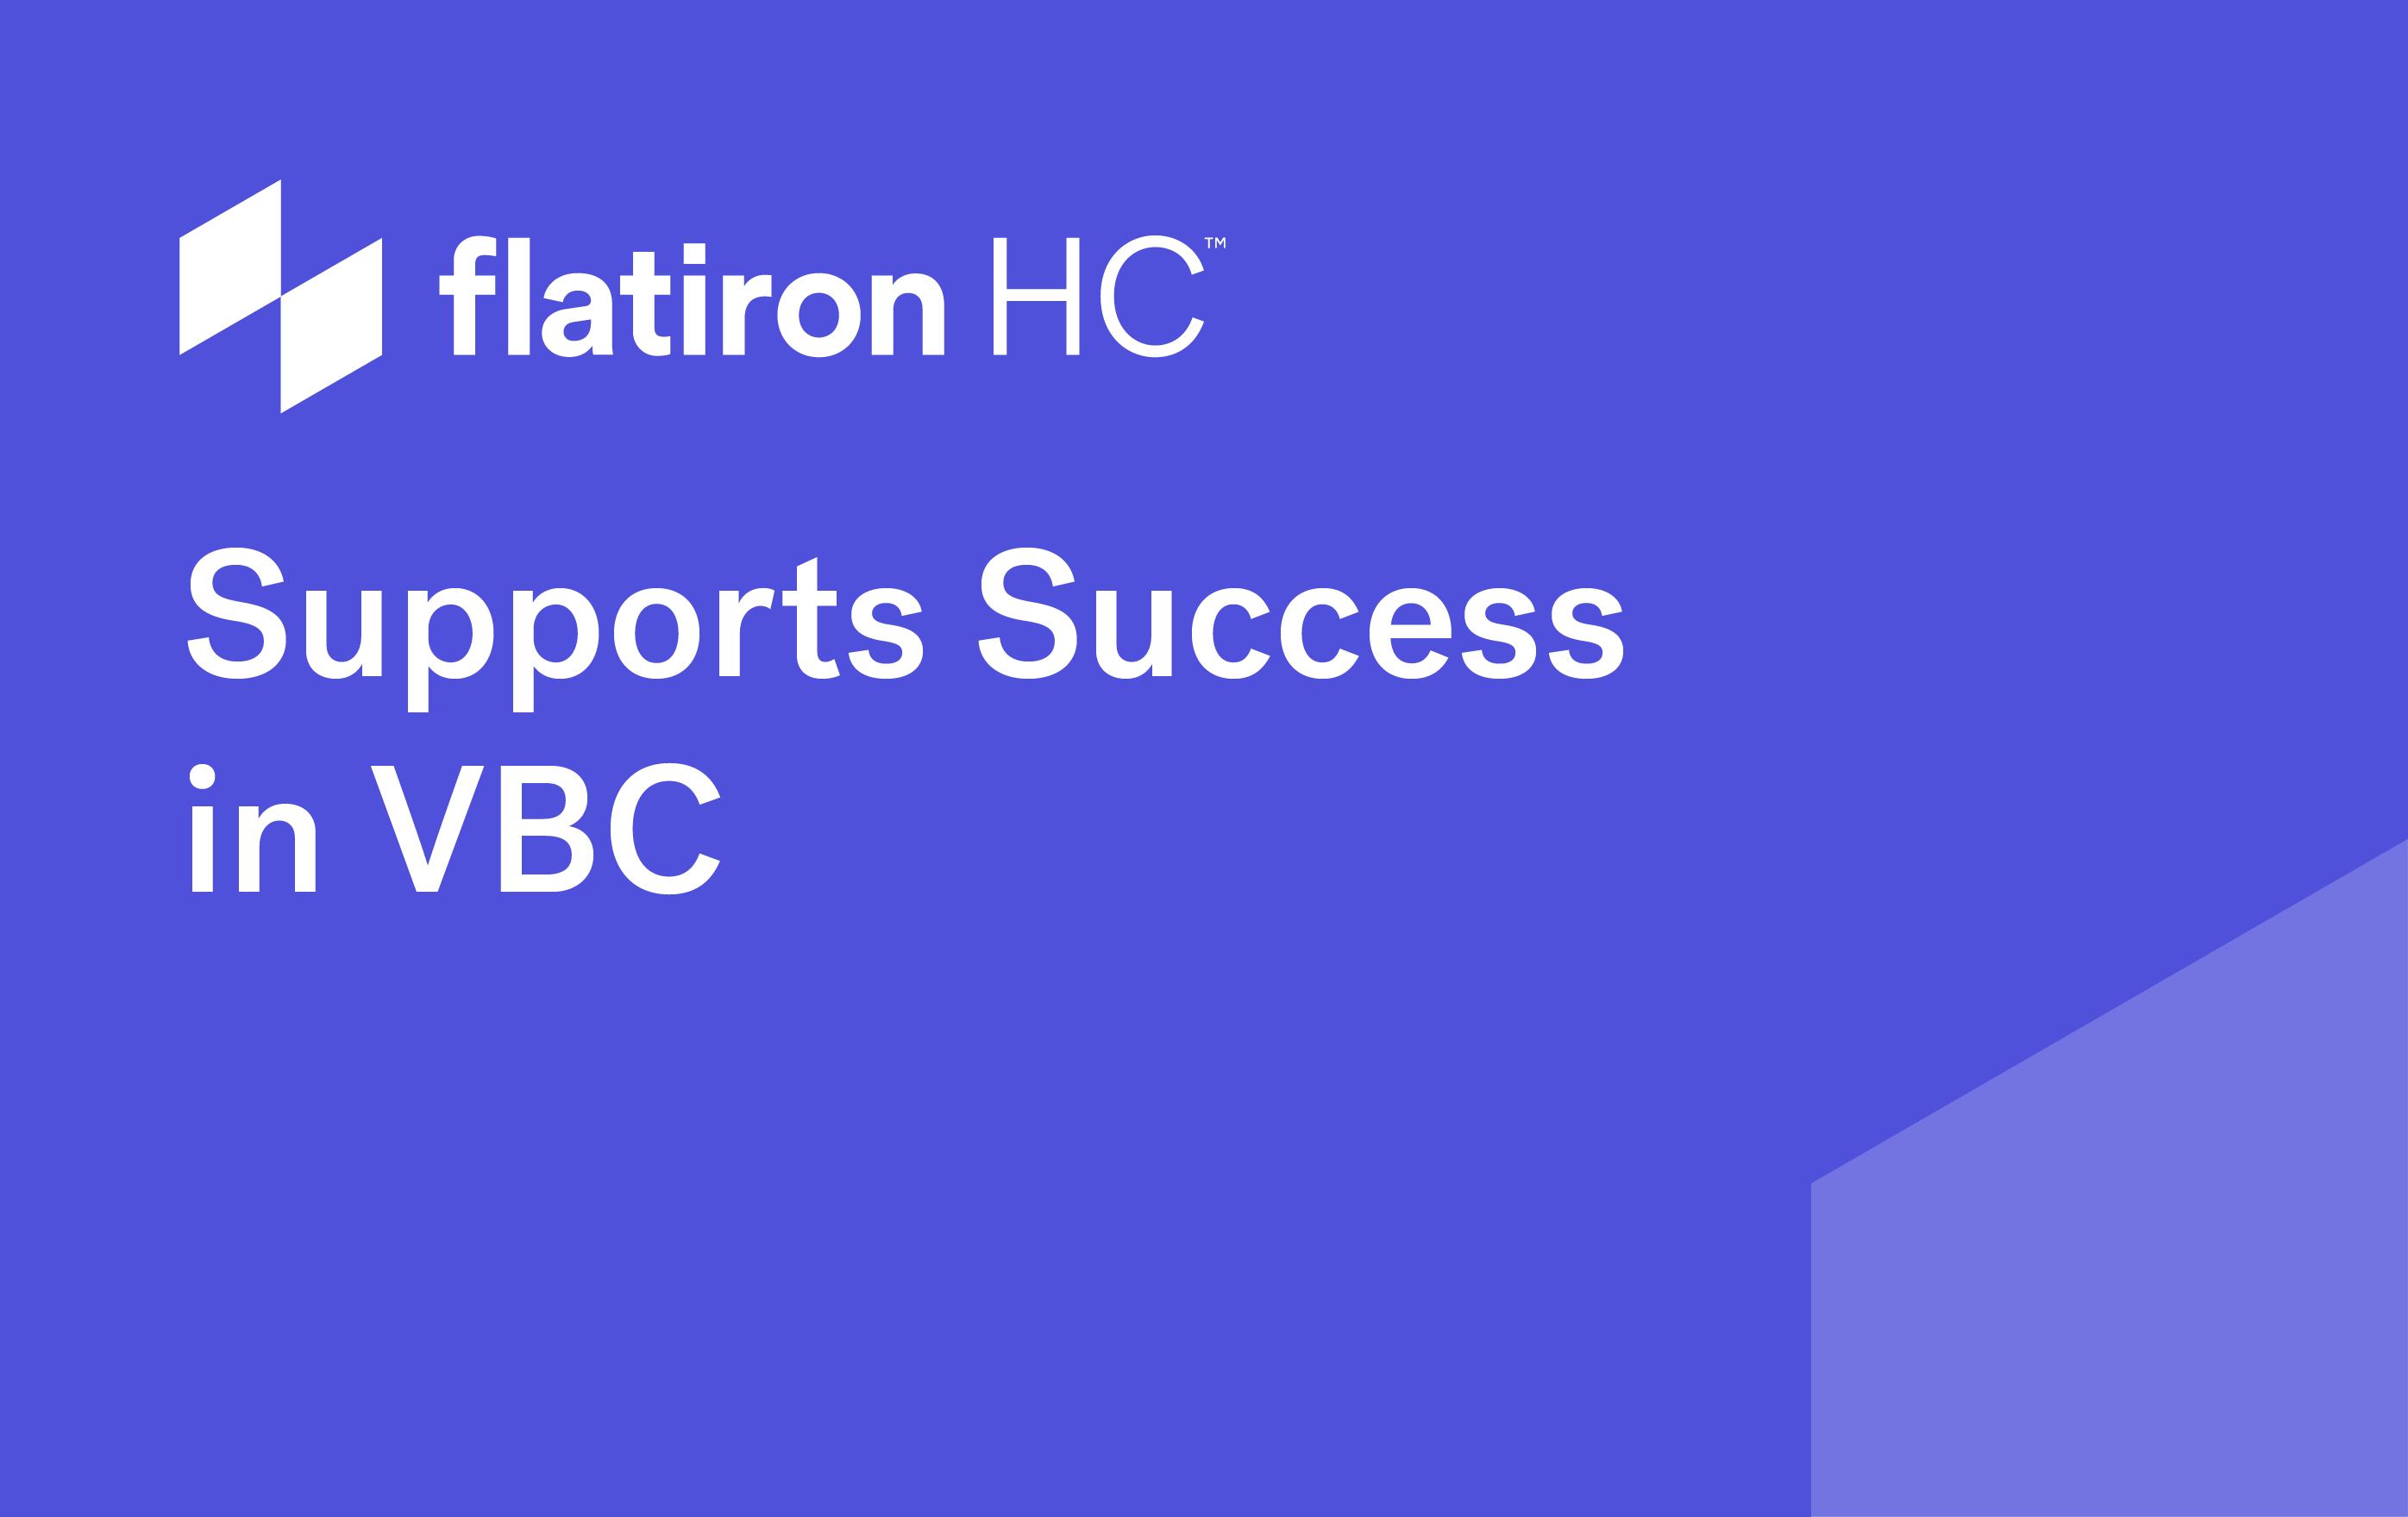 Flatiron HC Supports Success in VBC